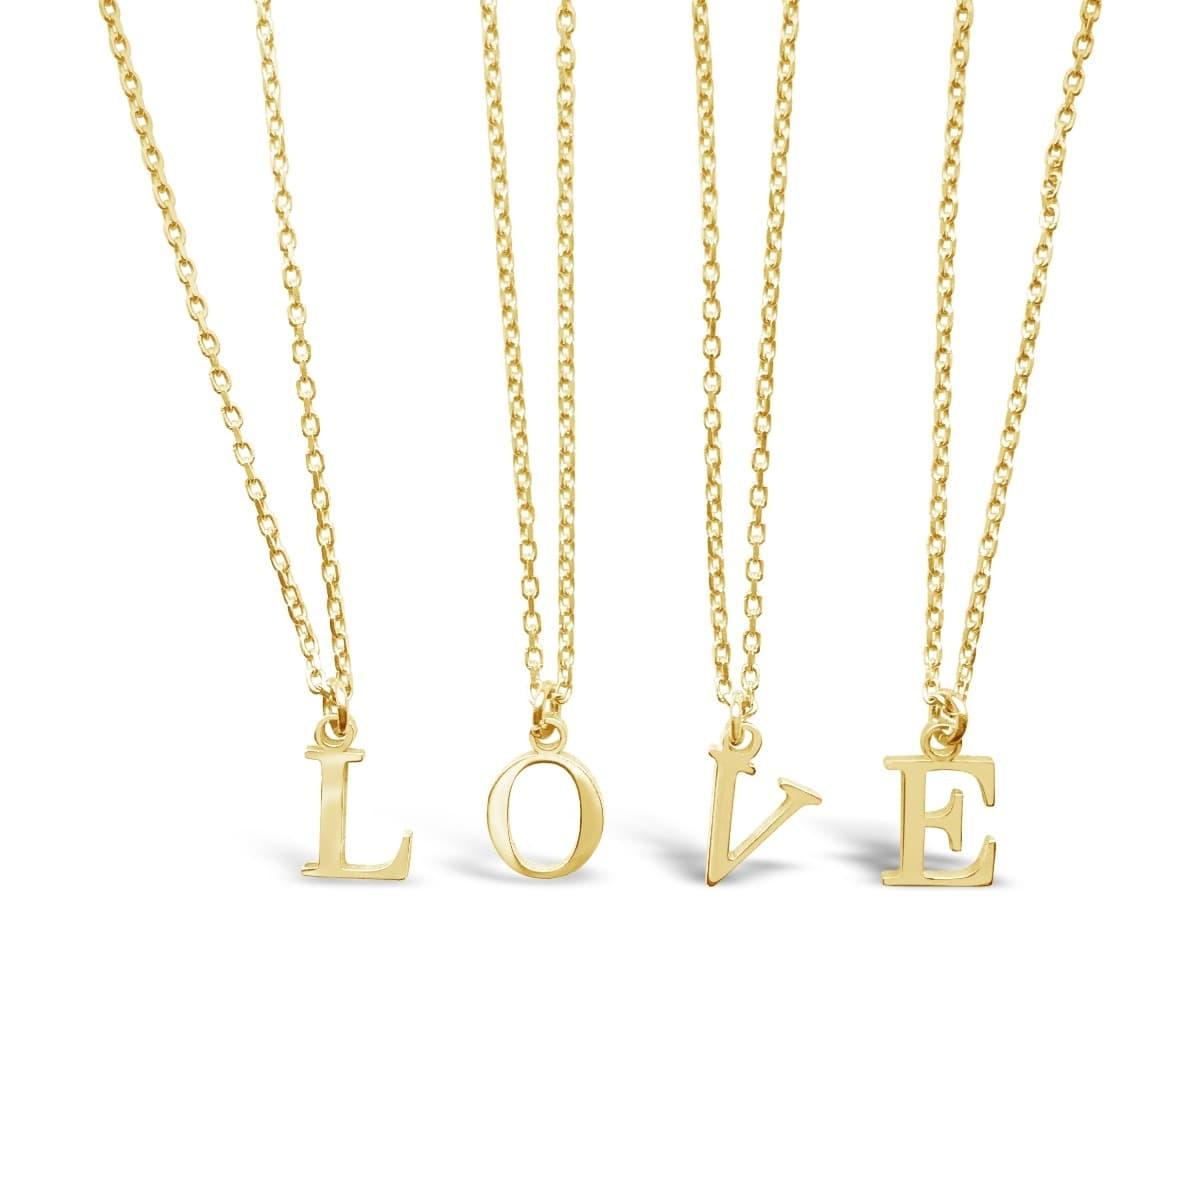 Gold Vermeil Initial Charm Necklace